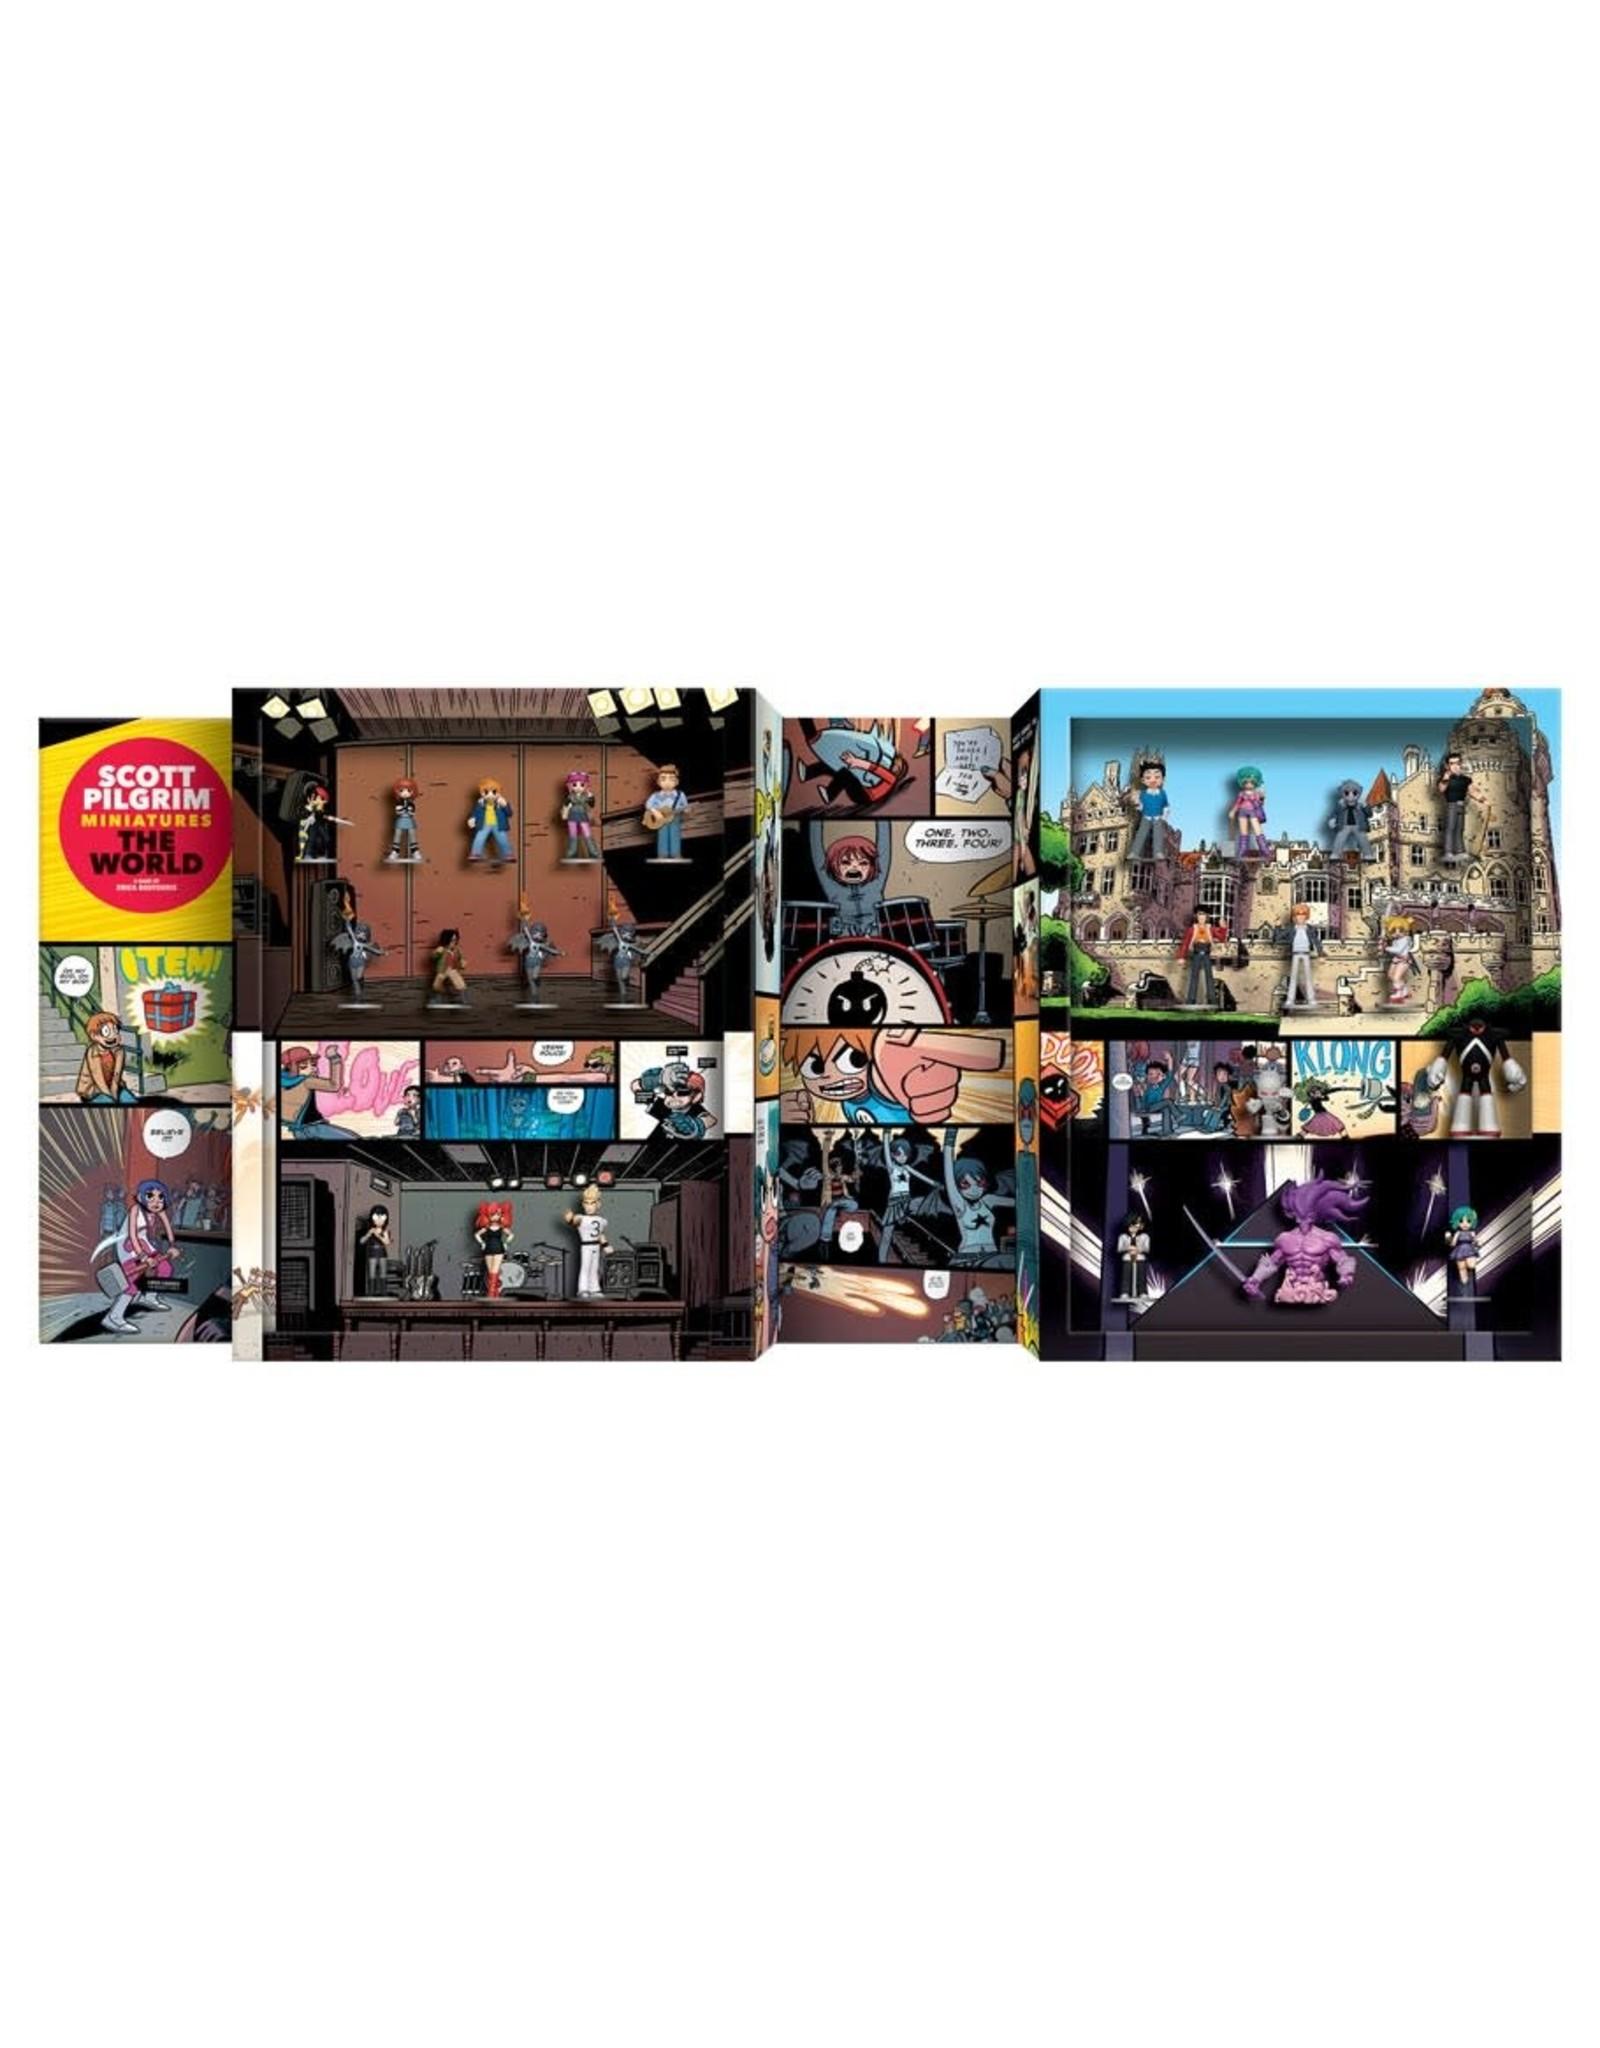 Renegade PREORDER: Scott Pilgrim Miniatures The World: Collectors Edition Figure Set